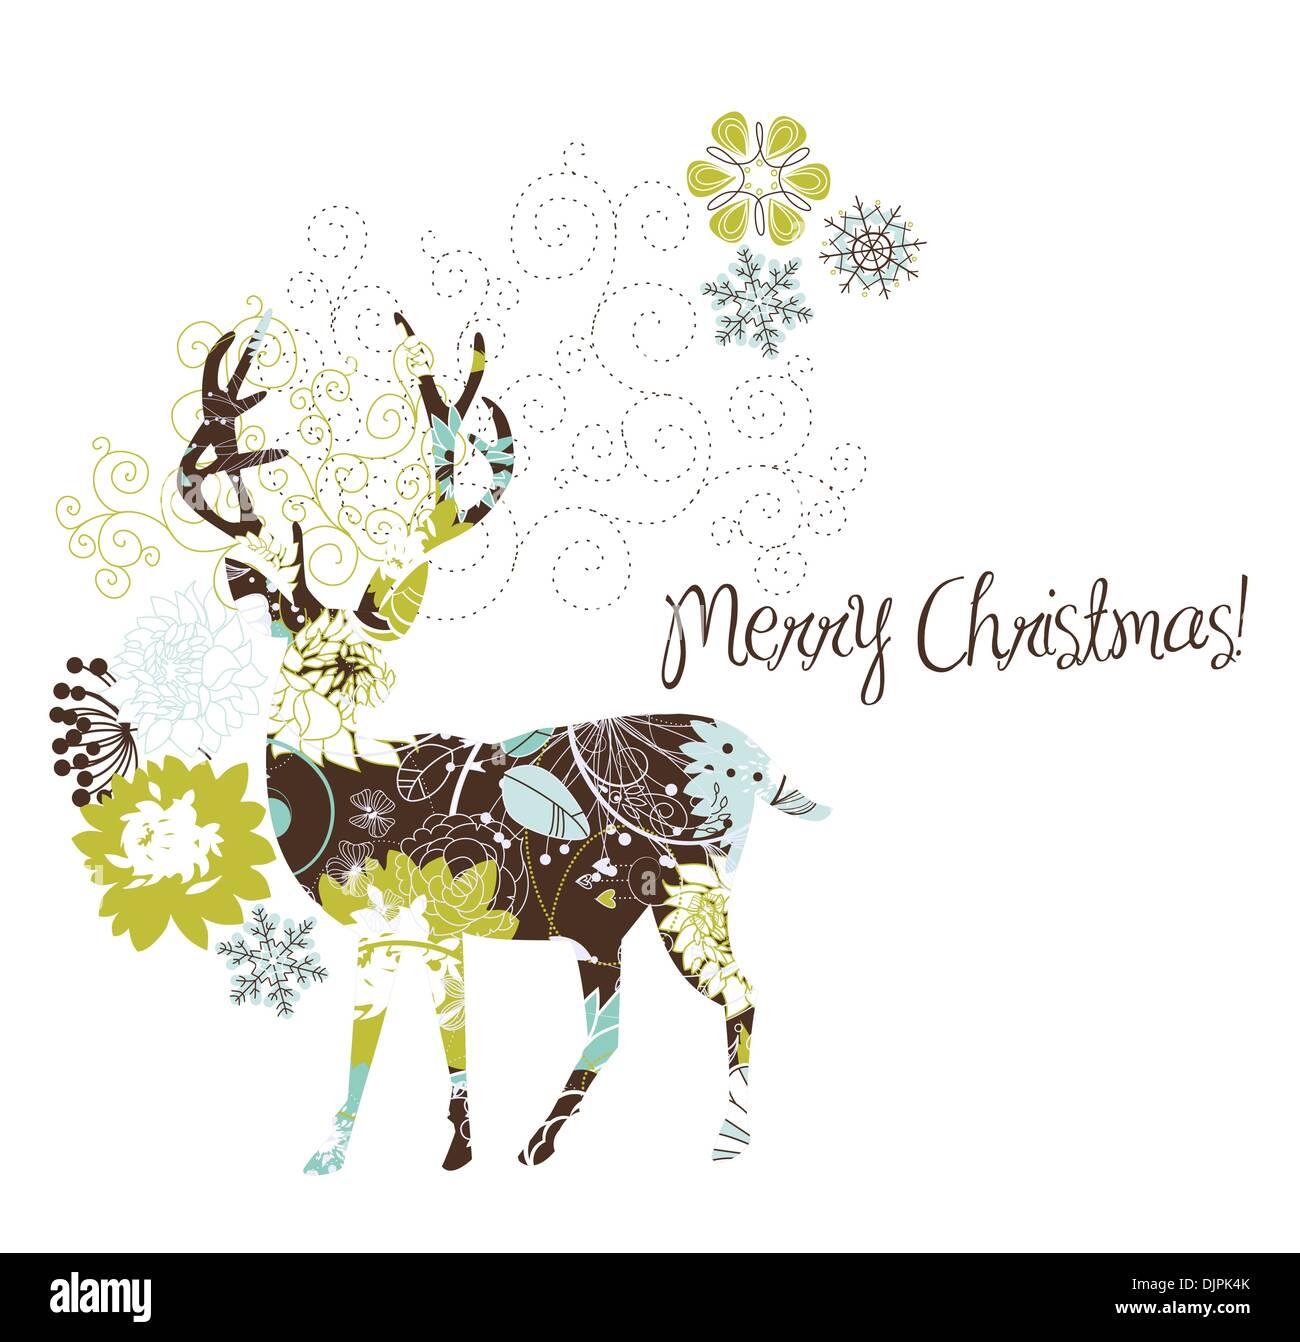 two deer and snow stock vector images alamy rh alamy com Deer Silhouette Vector Elk Vector